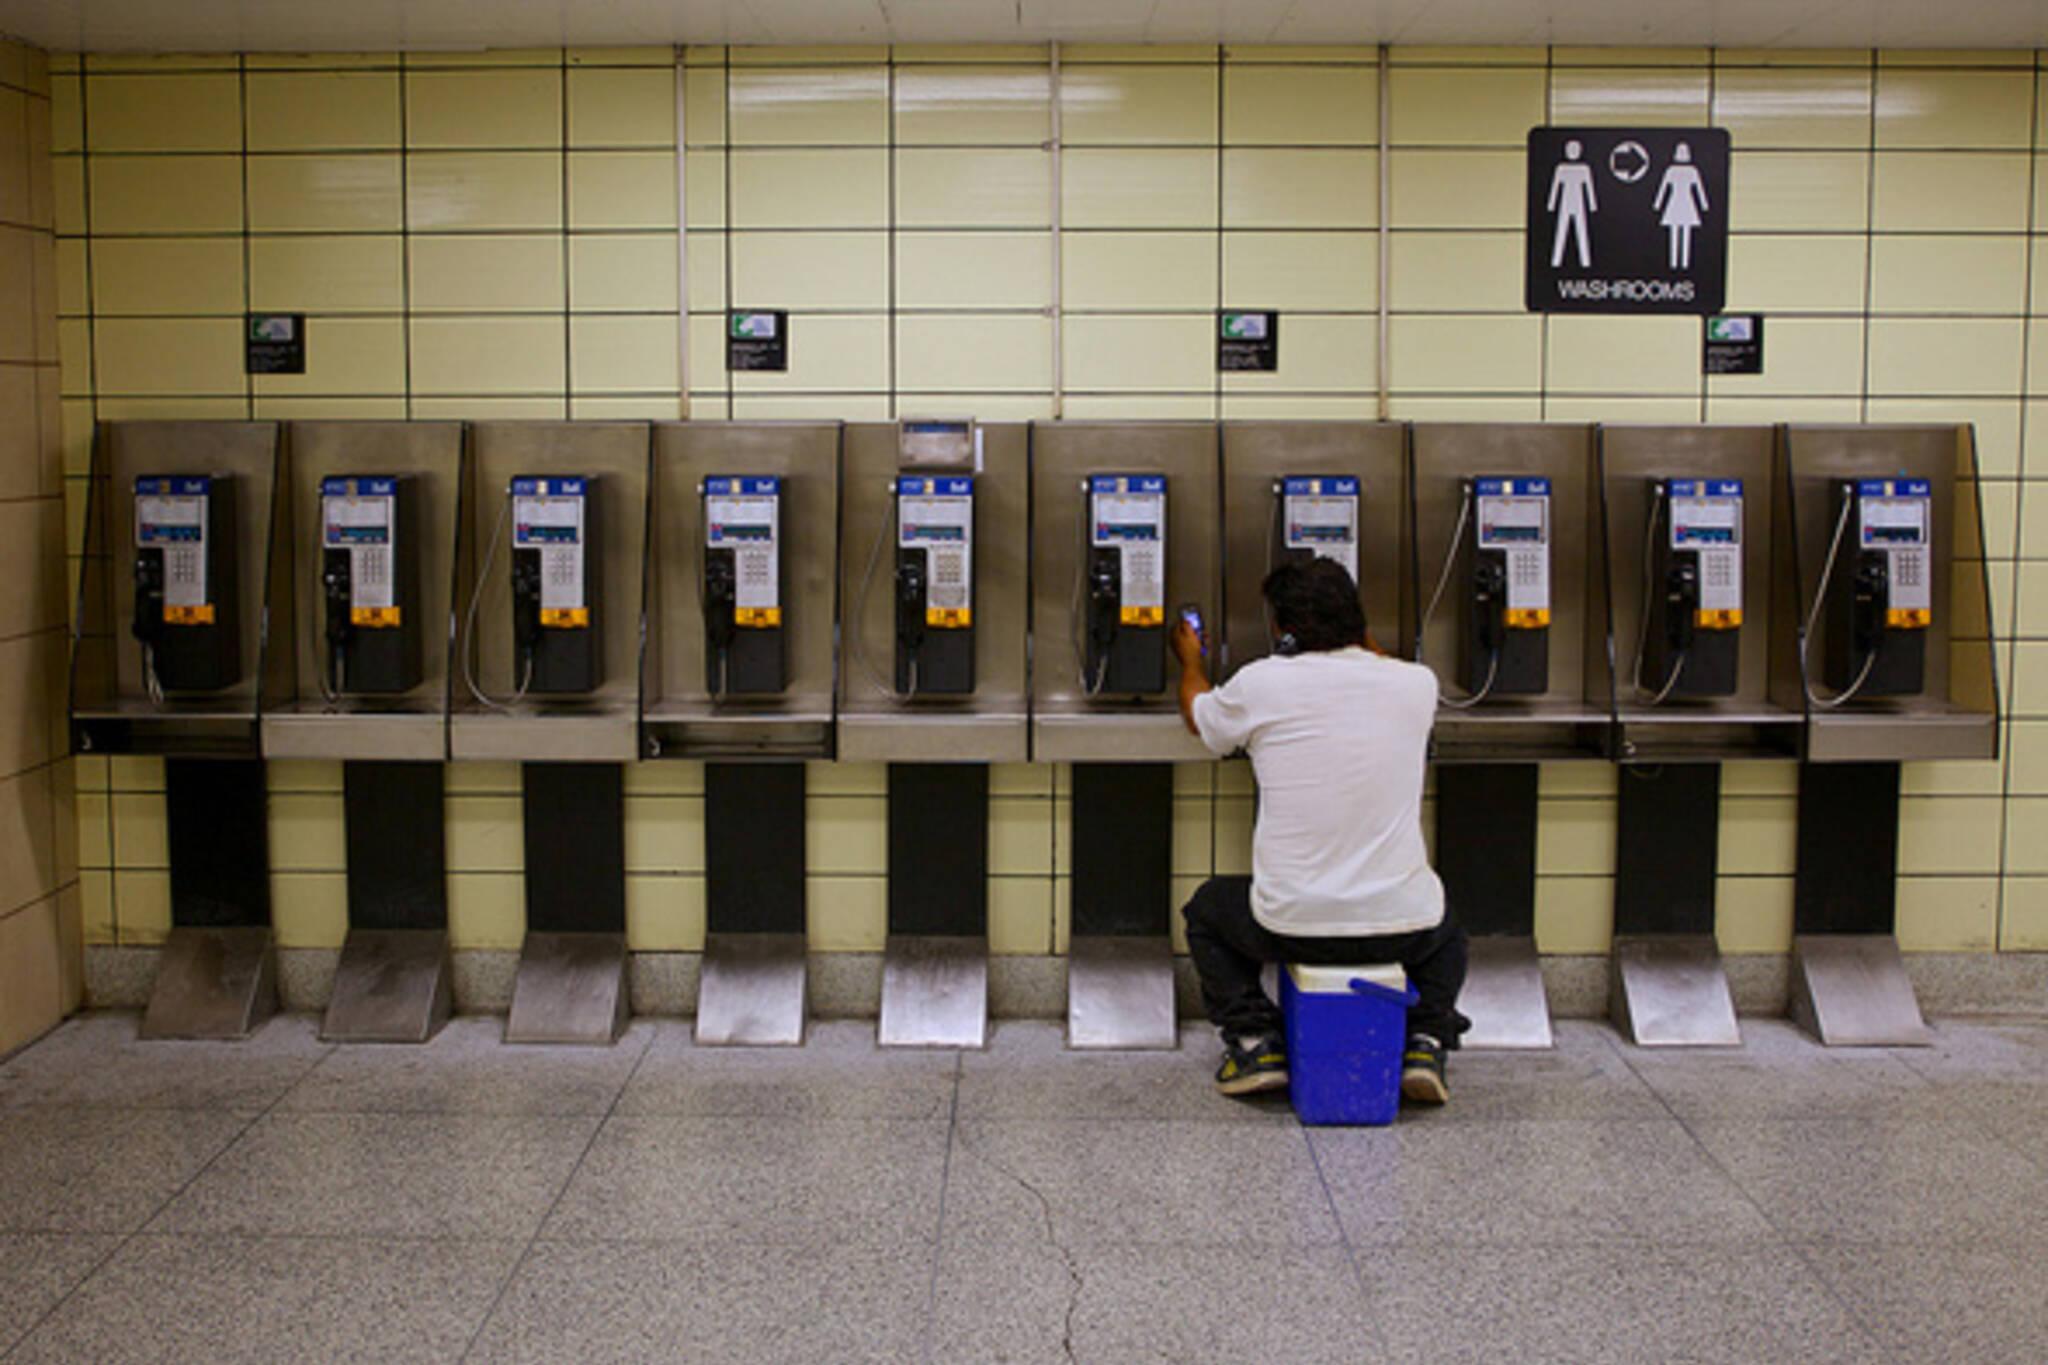 Phone Booths Toronto